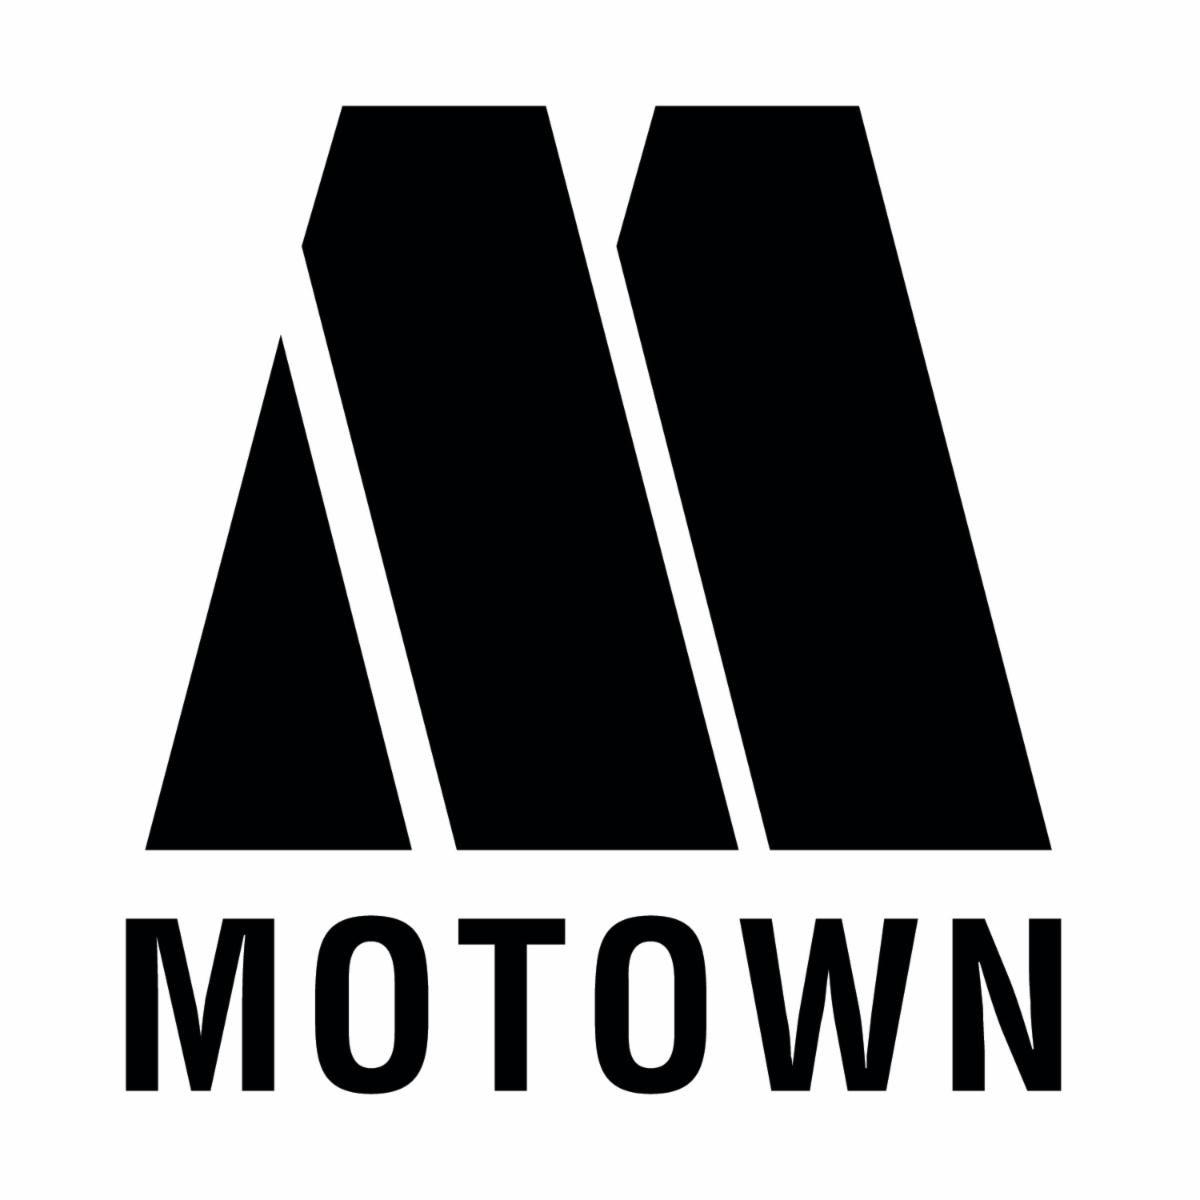 Motown_Black-01.jpg